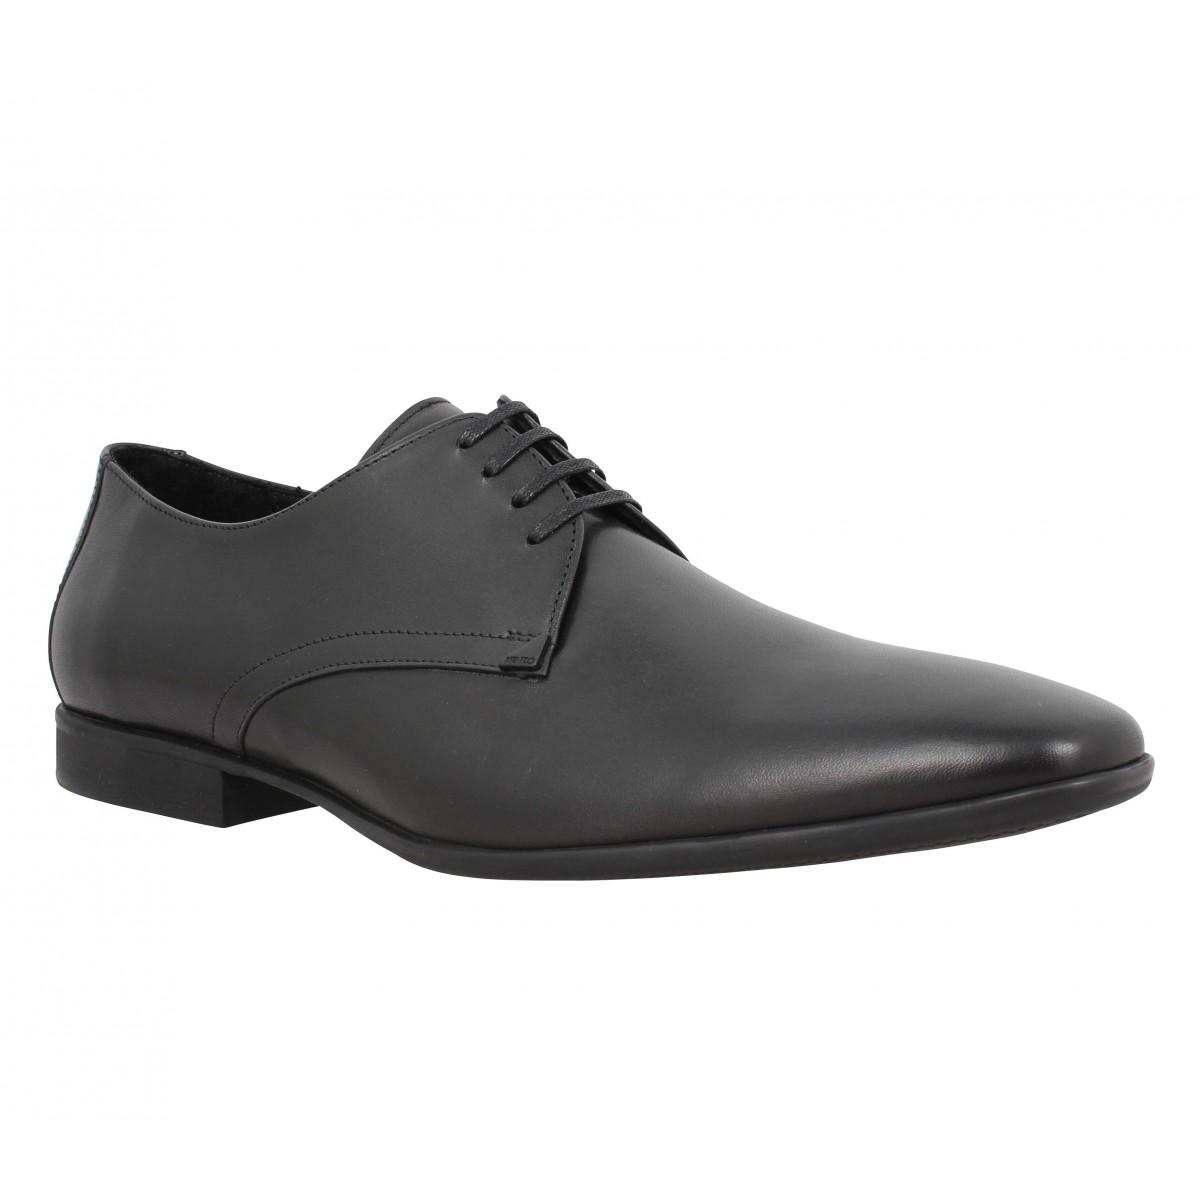 Chaussures à lacets KENZO Westy cuir Homme Noir